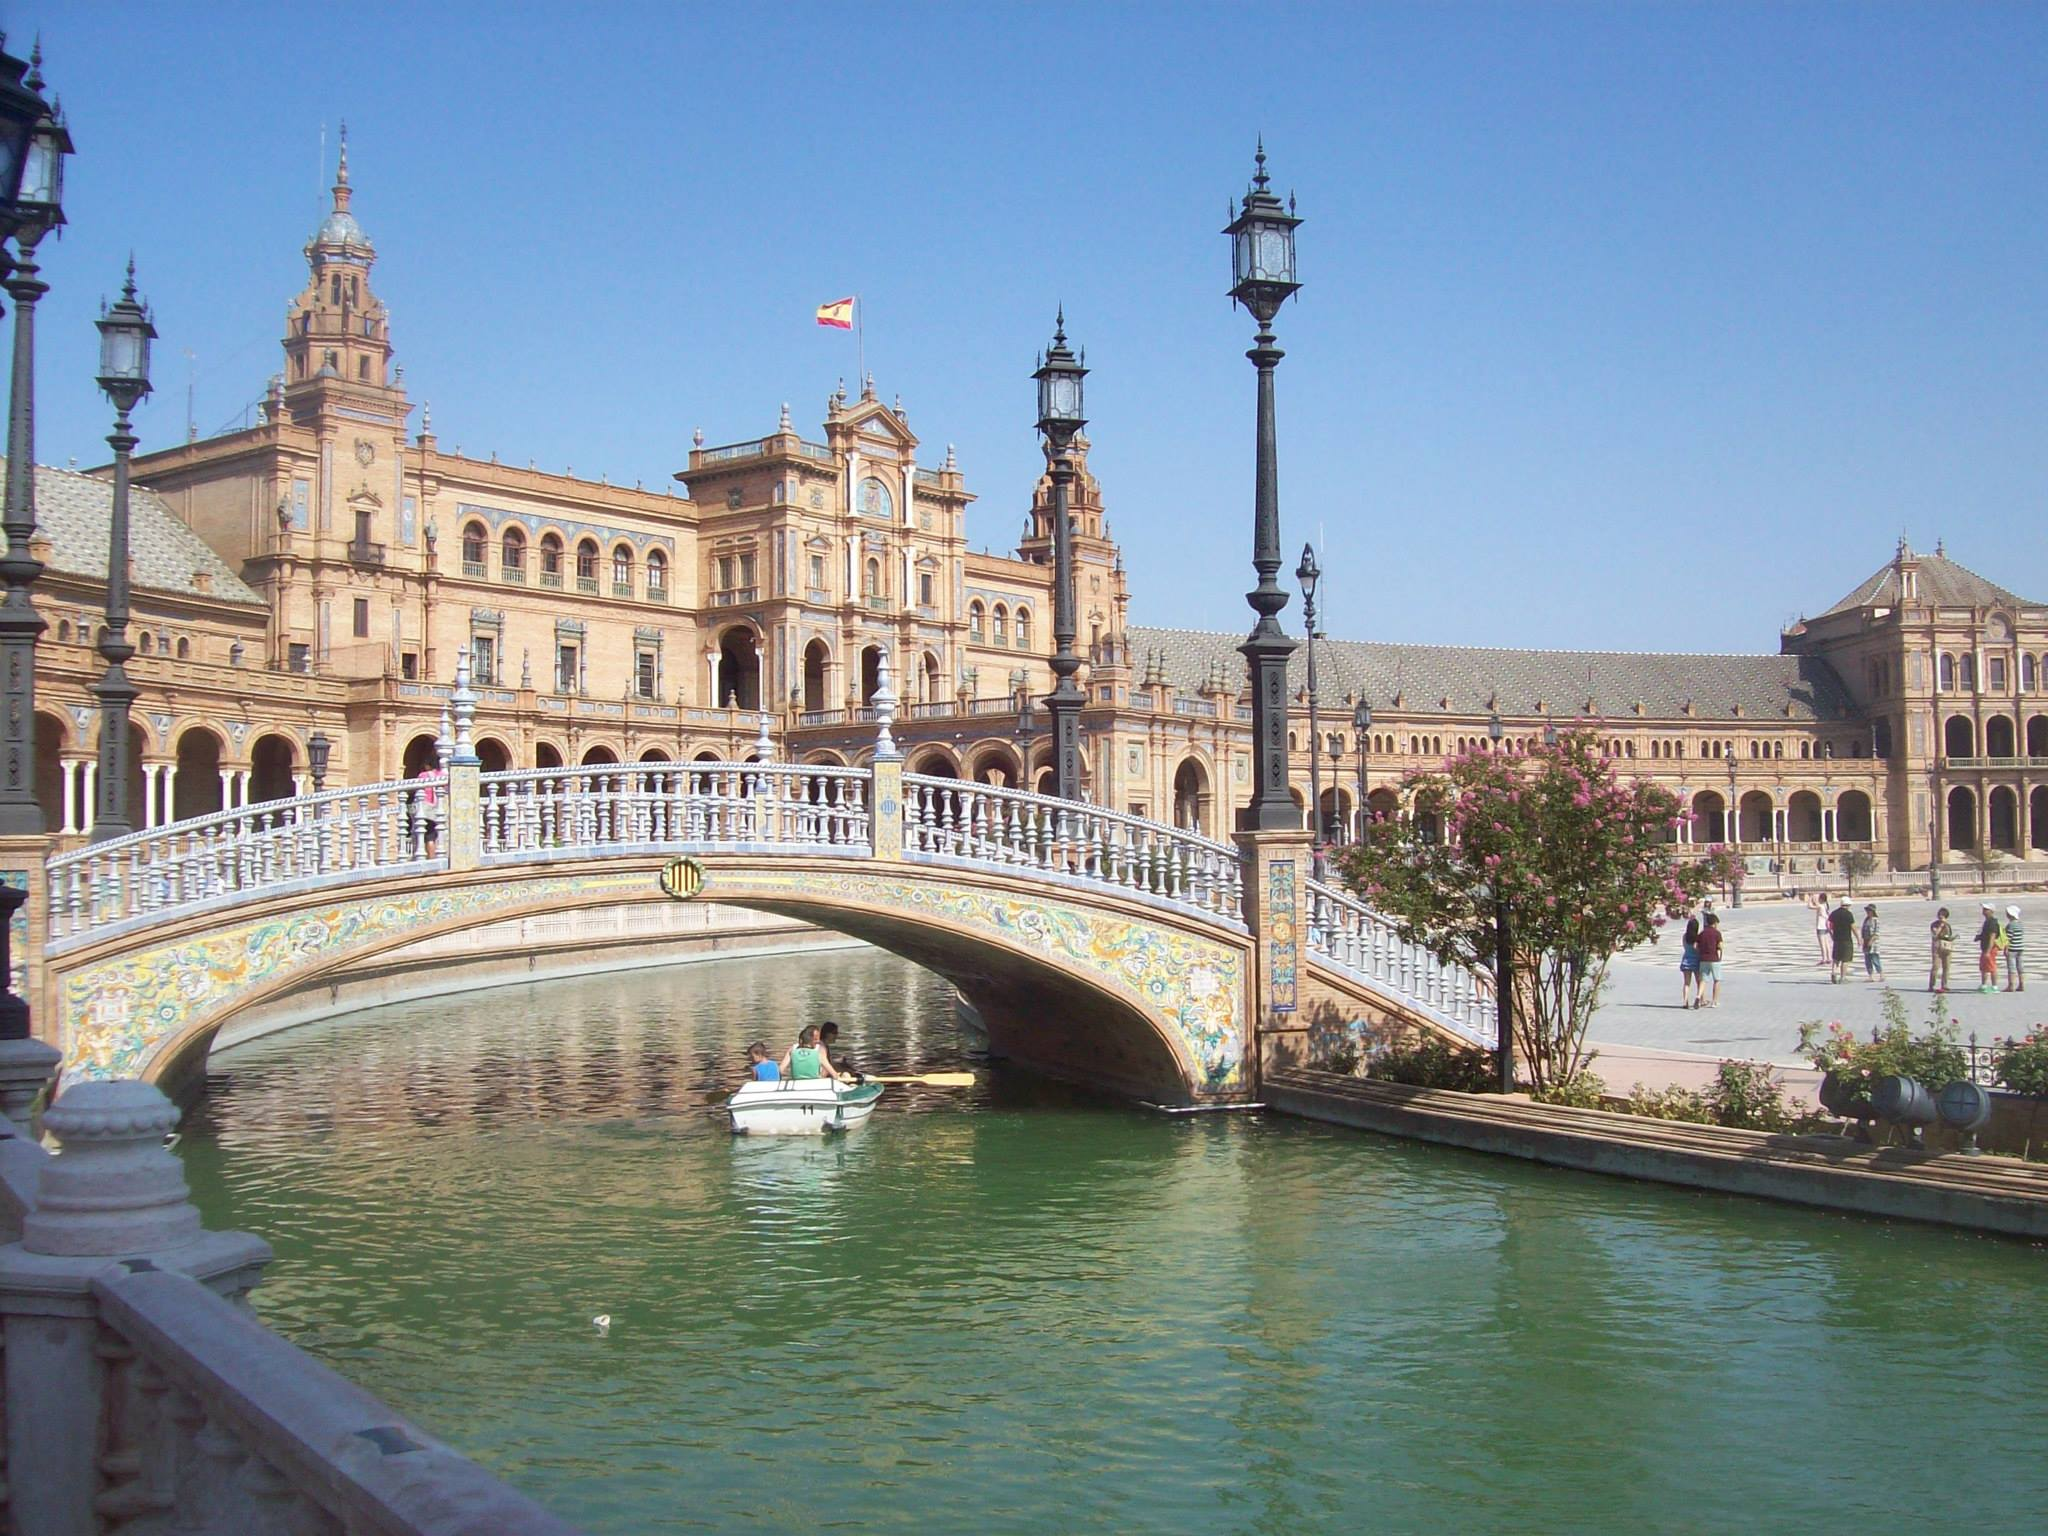 Plaza de espa a sevilla la pen nsula ib rica for Lugares turisticos para visitar en espana